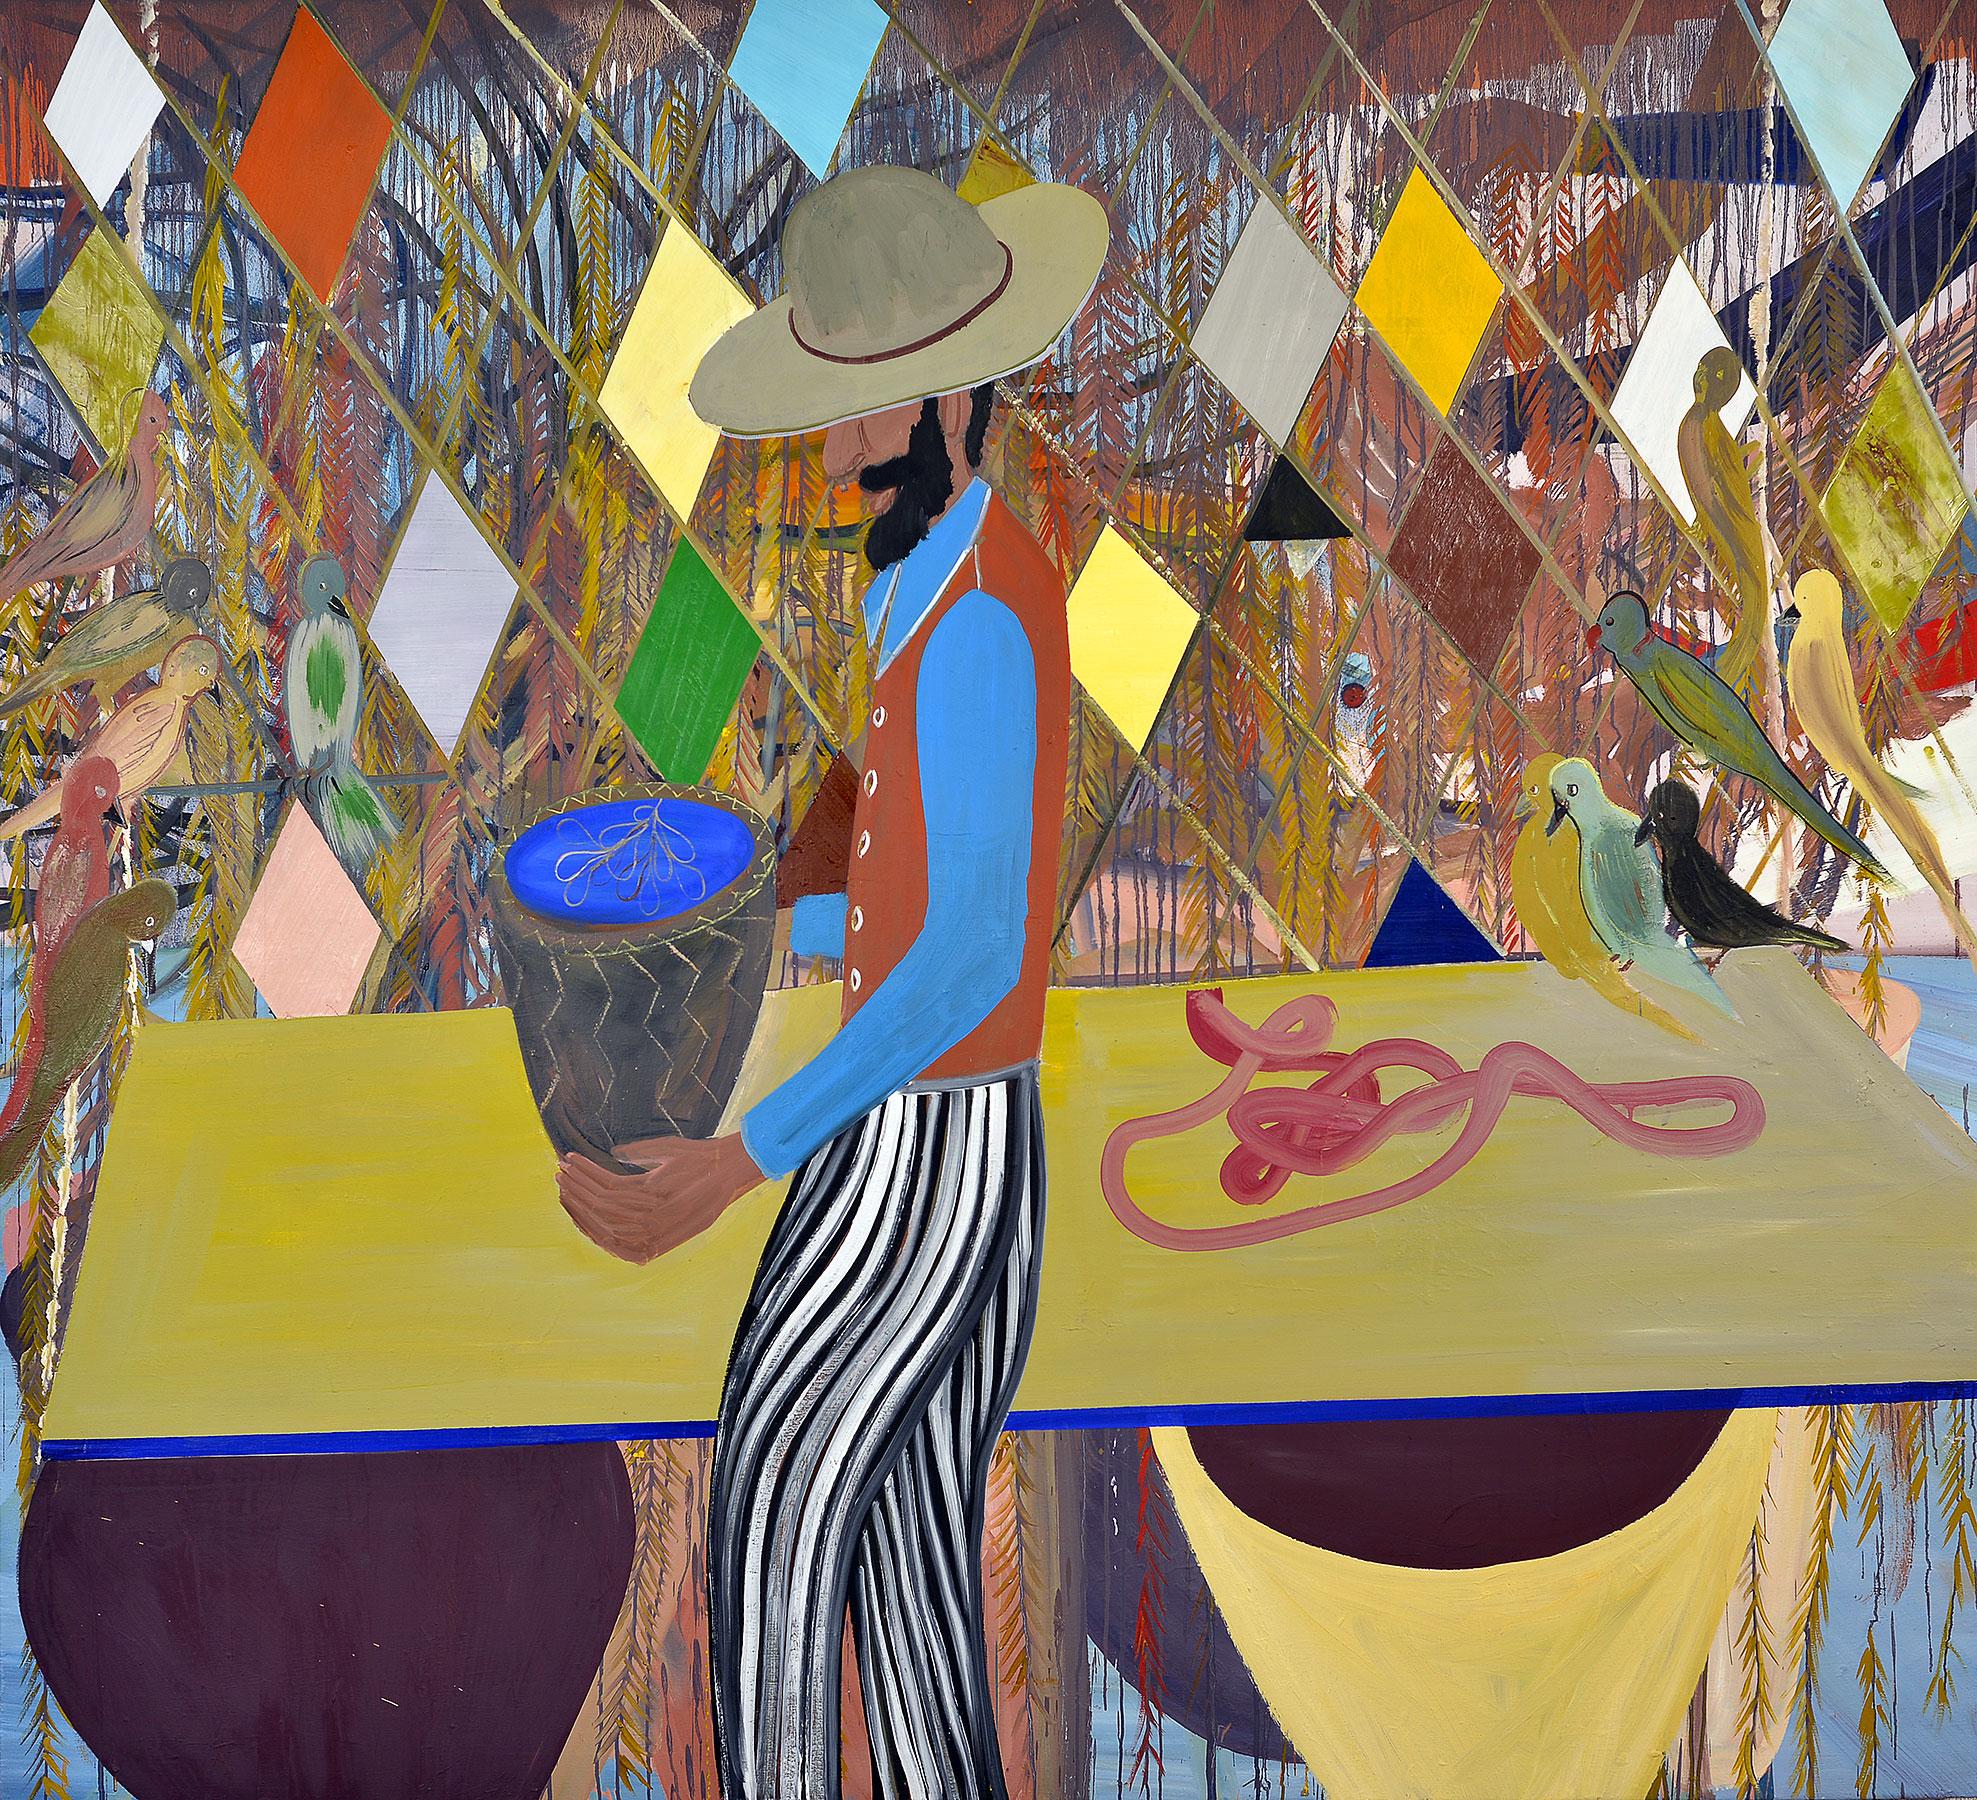 Rhombus, 2015    Oil on canvas, 188x212 cm